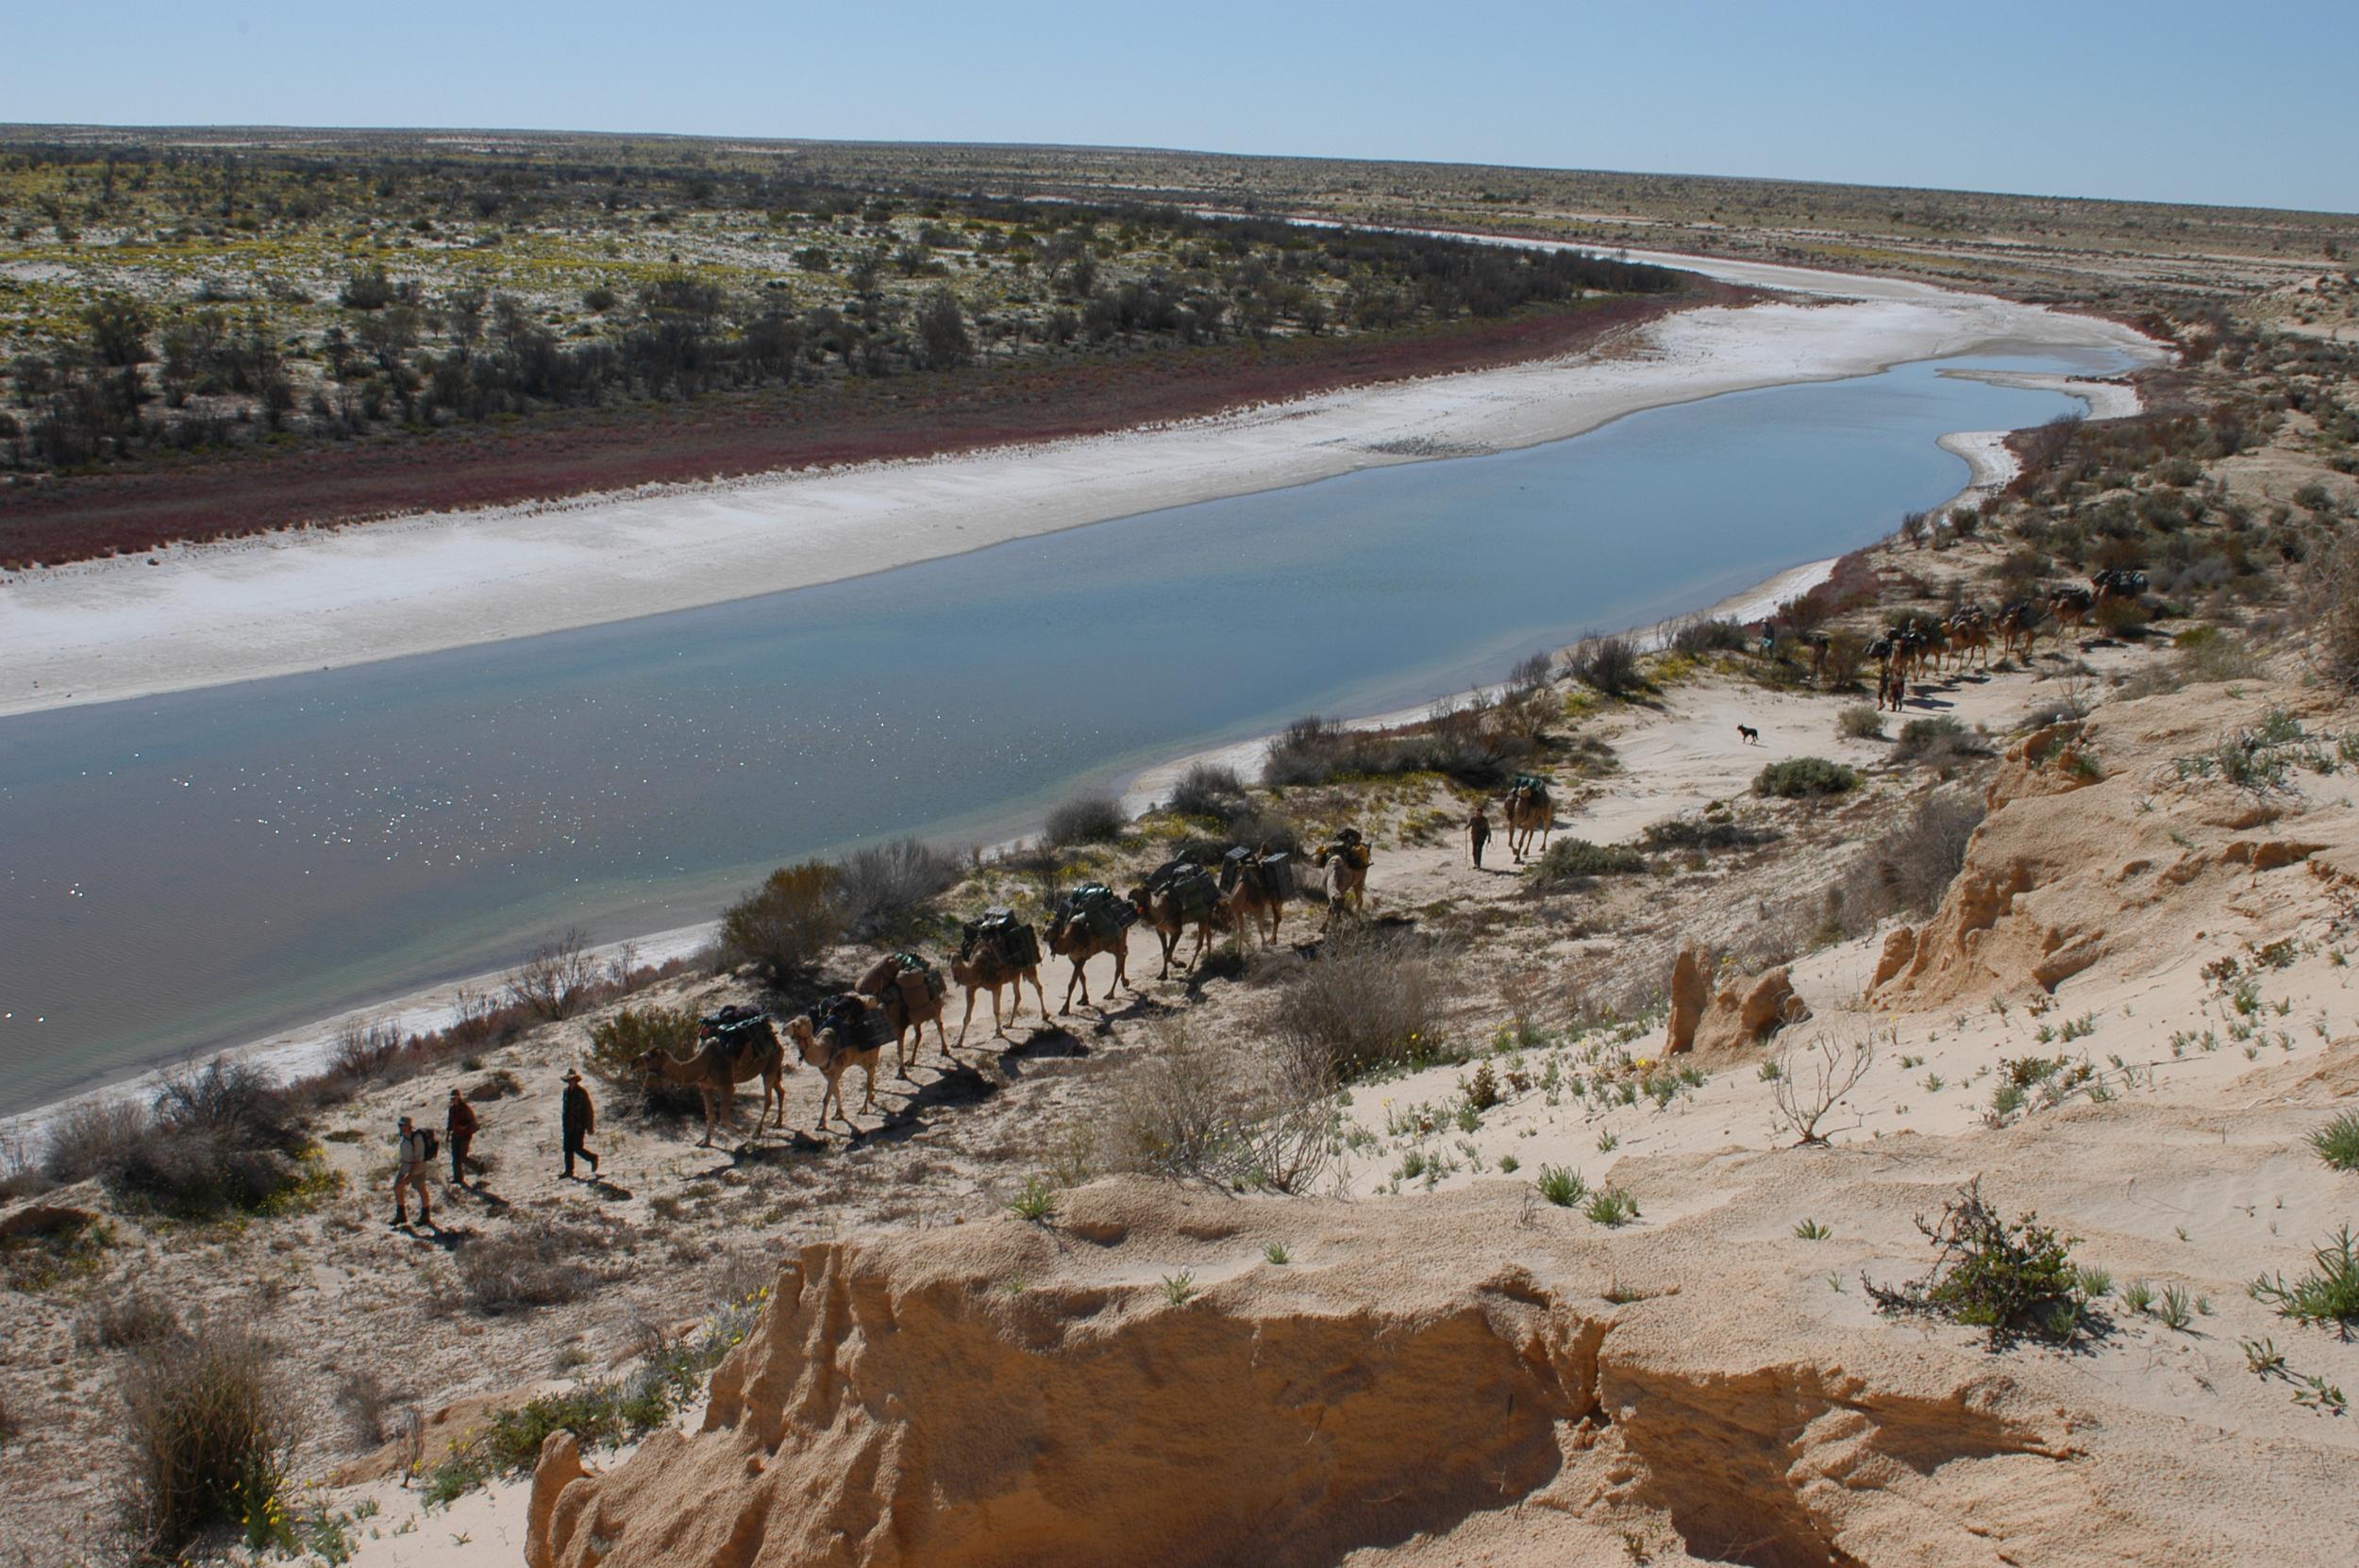 Along the Kallakoopah Creek, Arid Rivers Expedition.